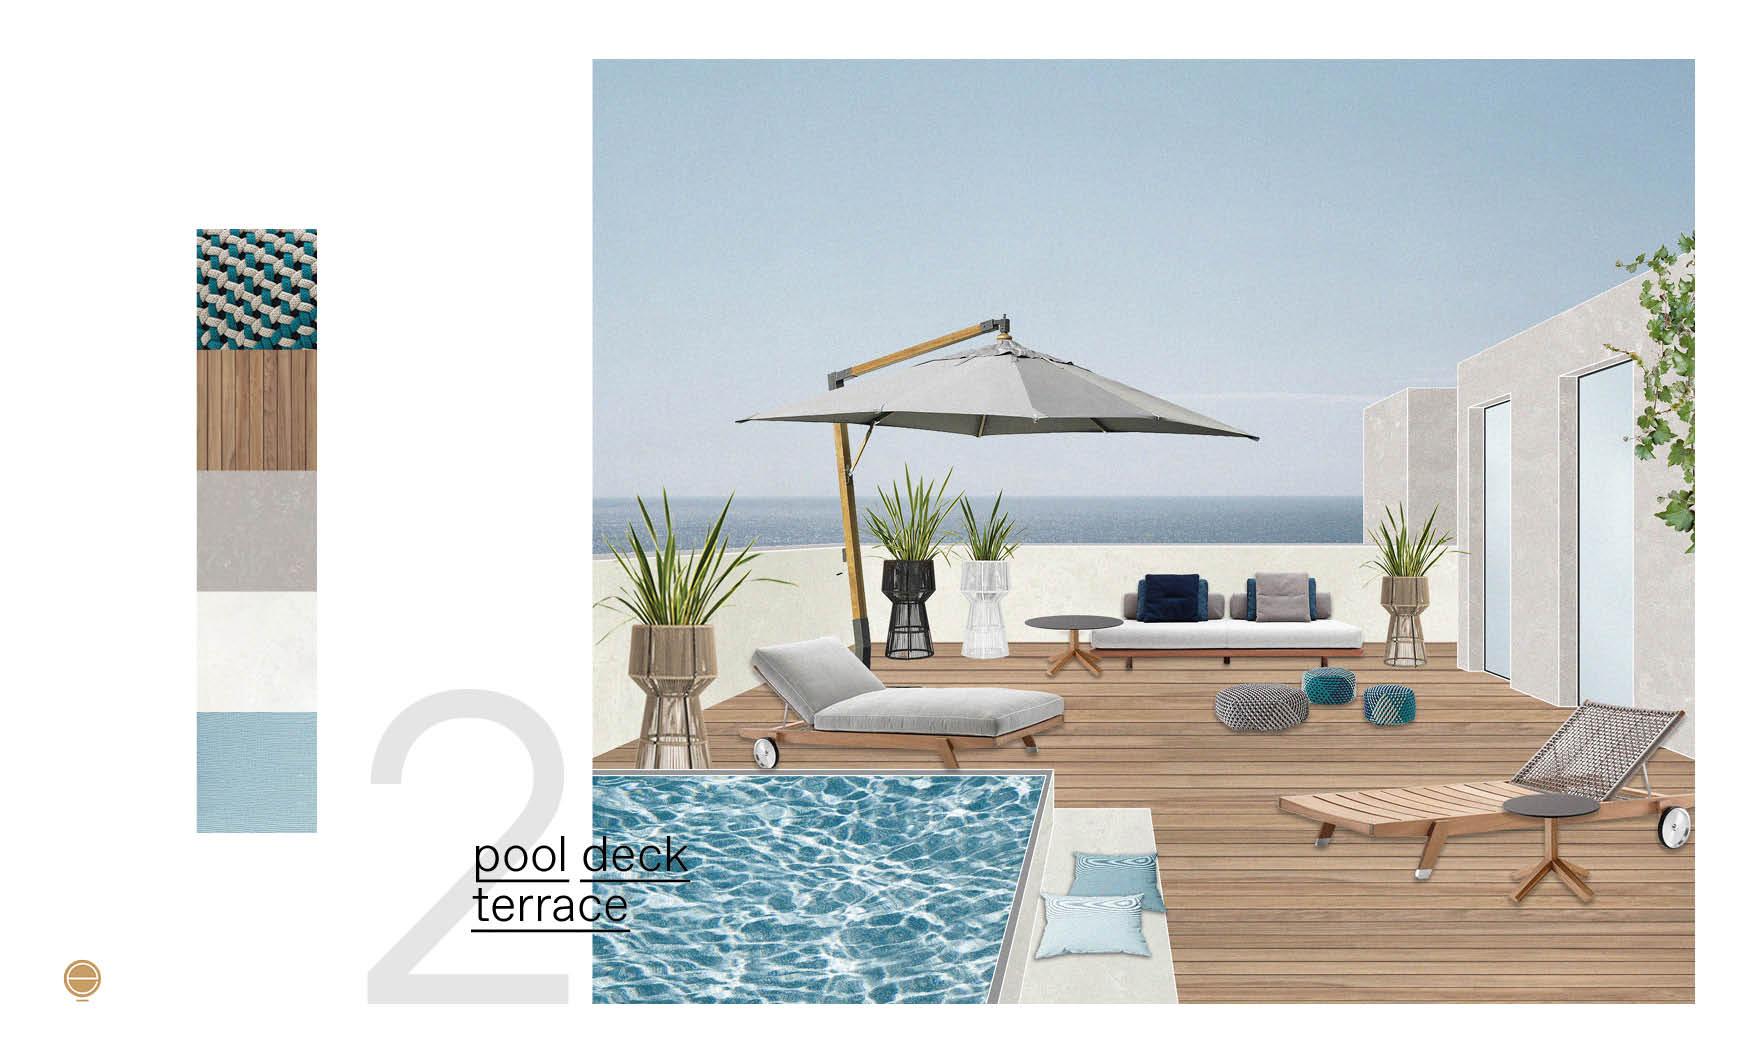 pool-deck Italian patio design project made by esperiri team